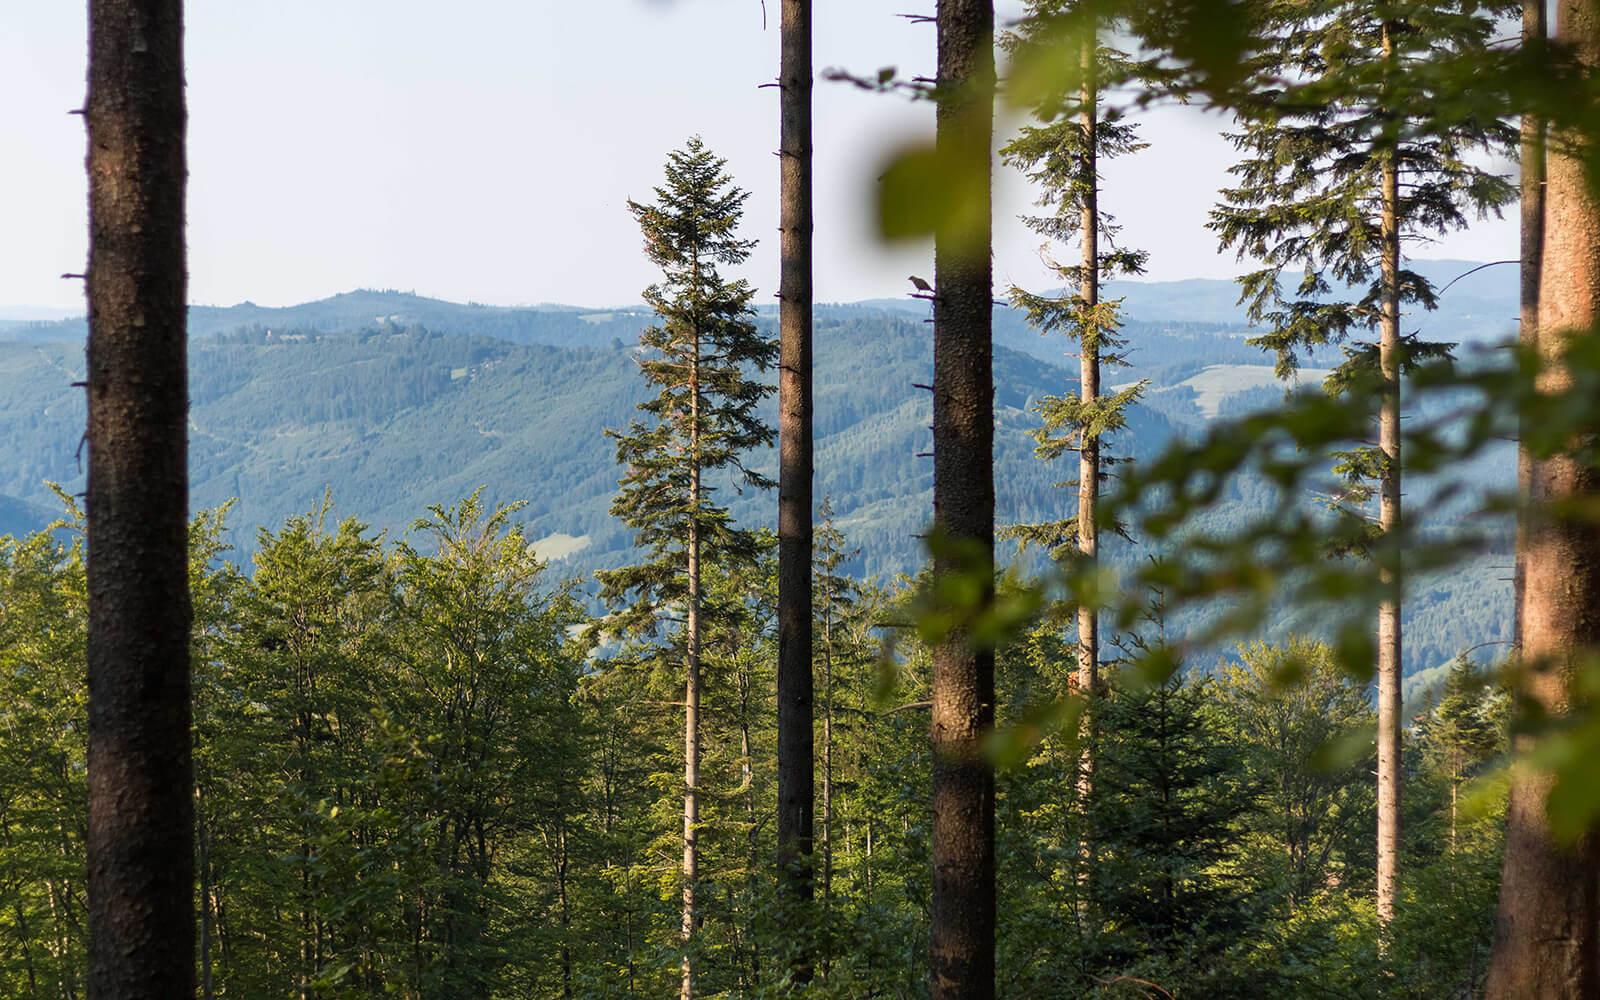 Widok zgór nainne góry